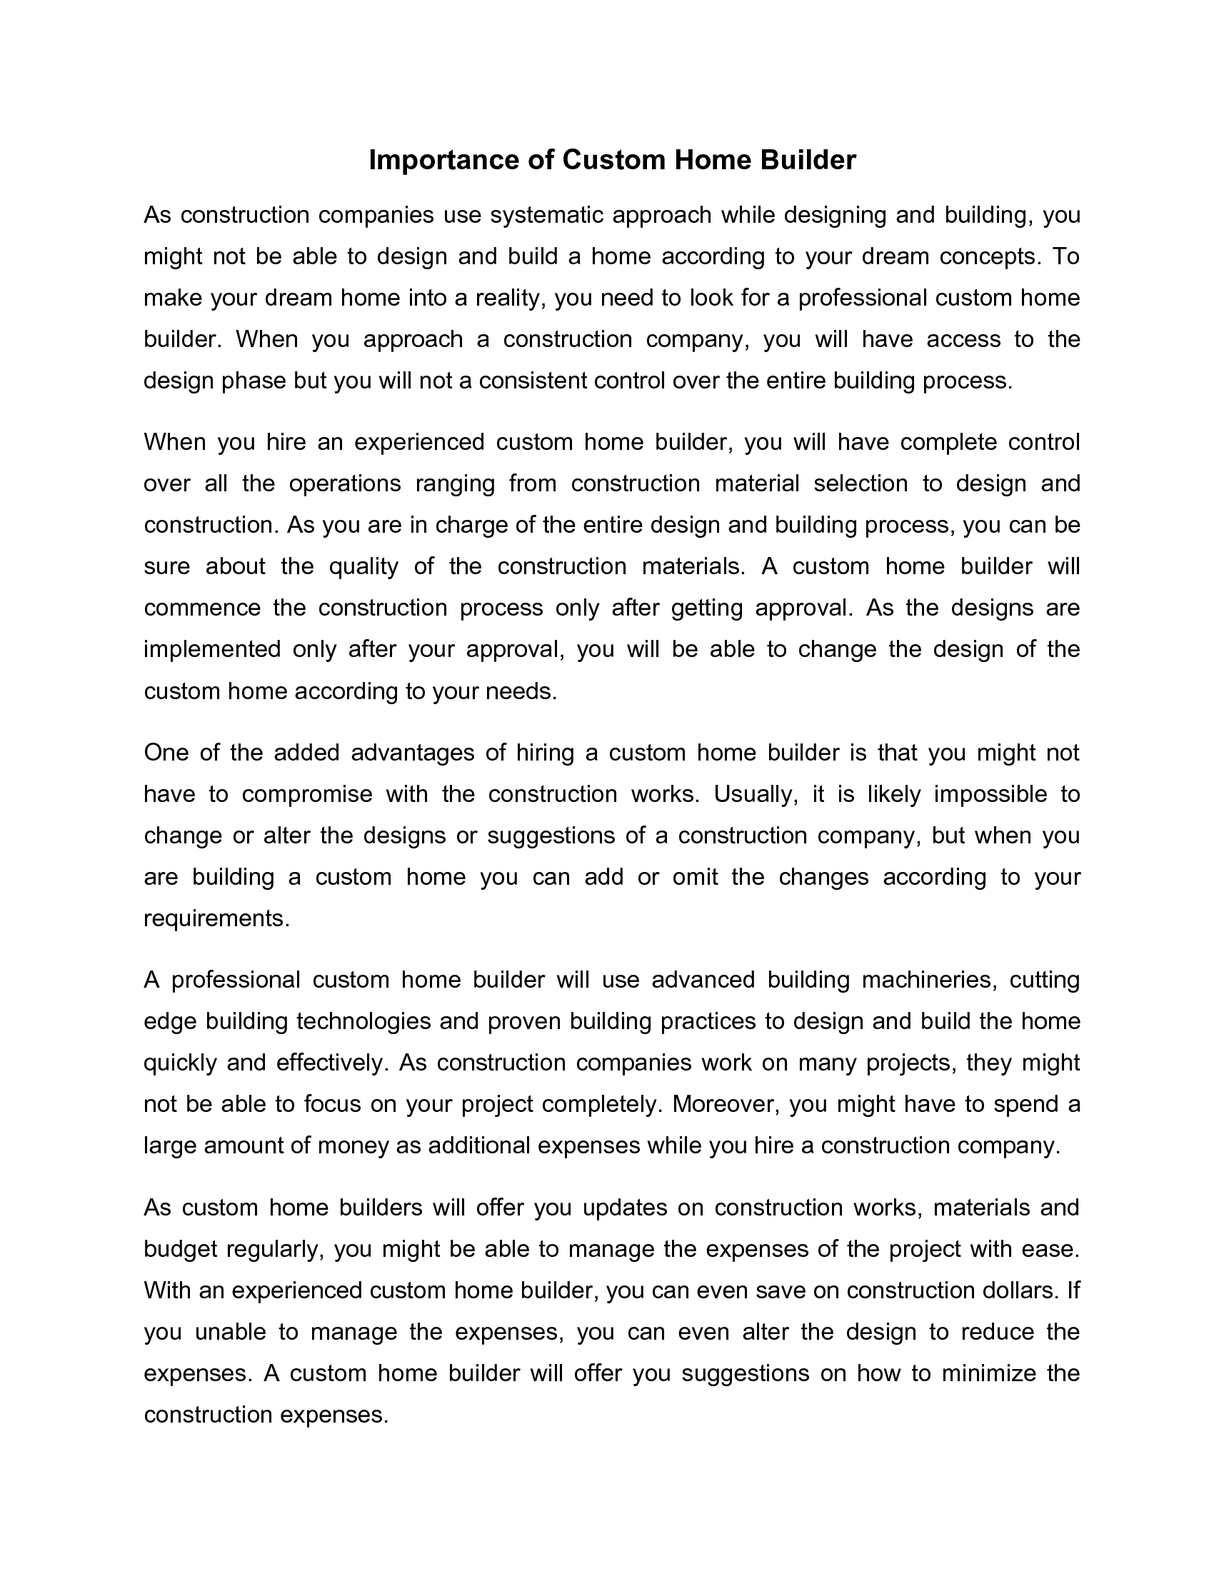 Calaméo Importance Of Custom Home Builder